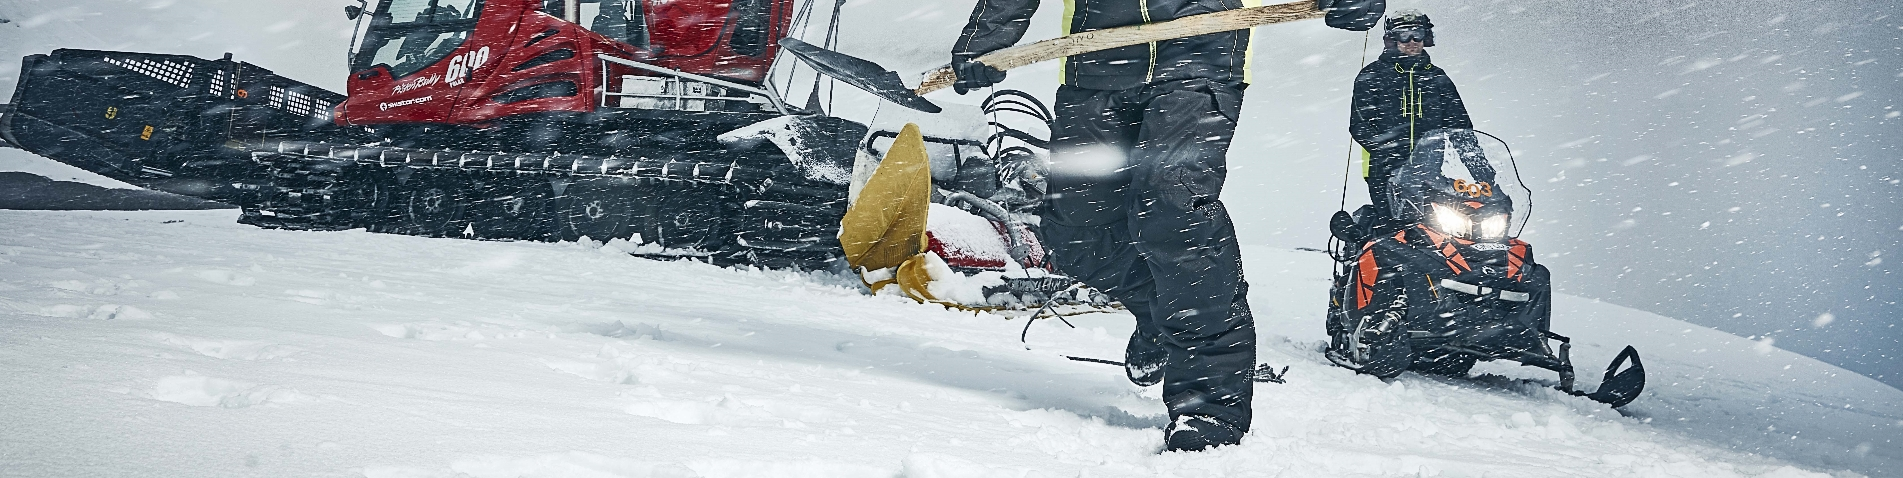 workwear4all-be -  Winter werkbroek banner breed